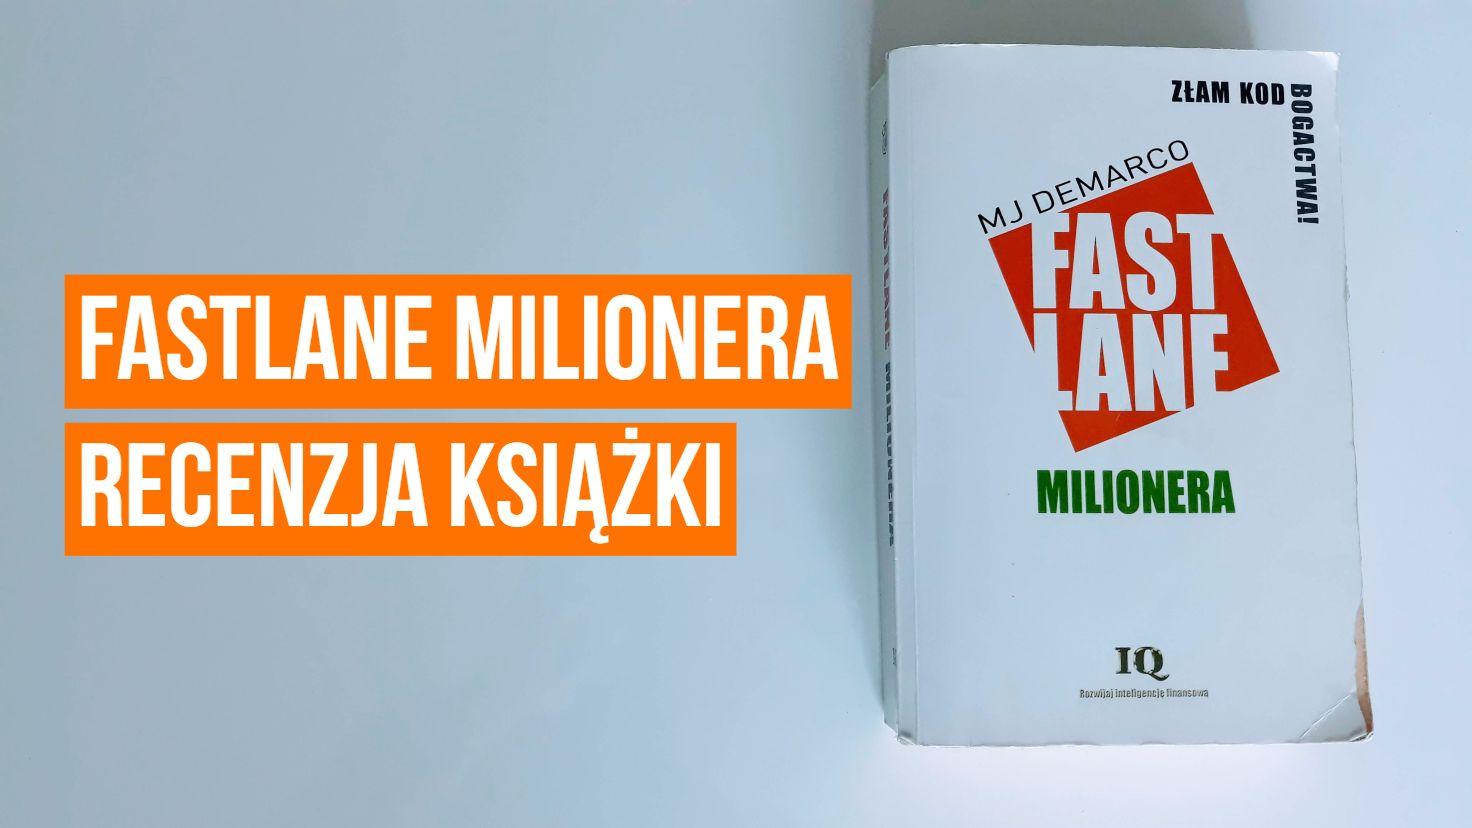 Fastlane Milionera - recenzja książki